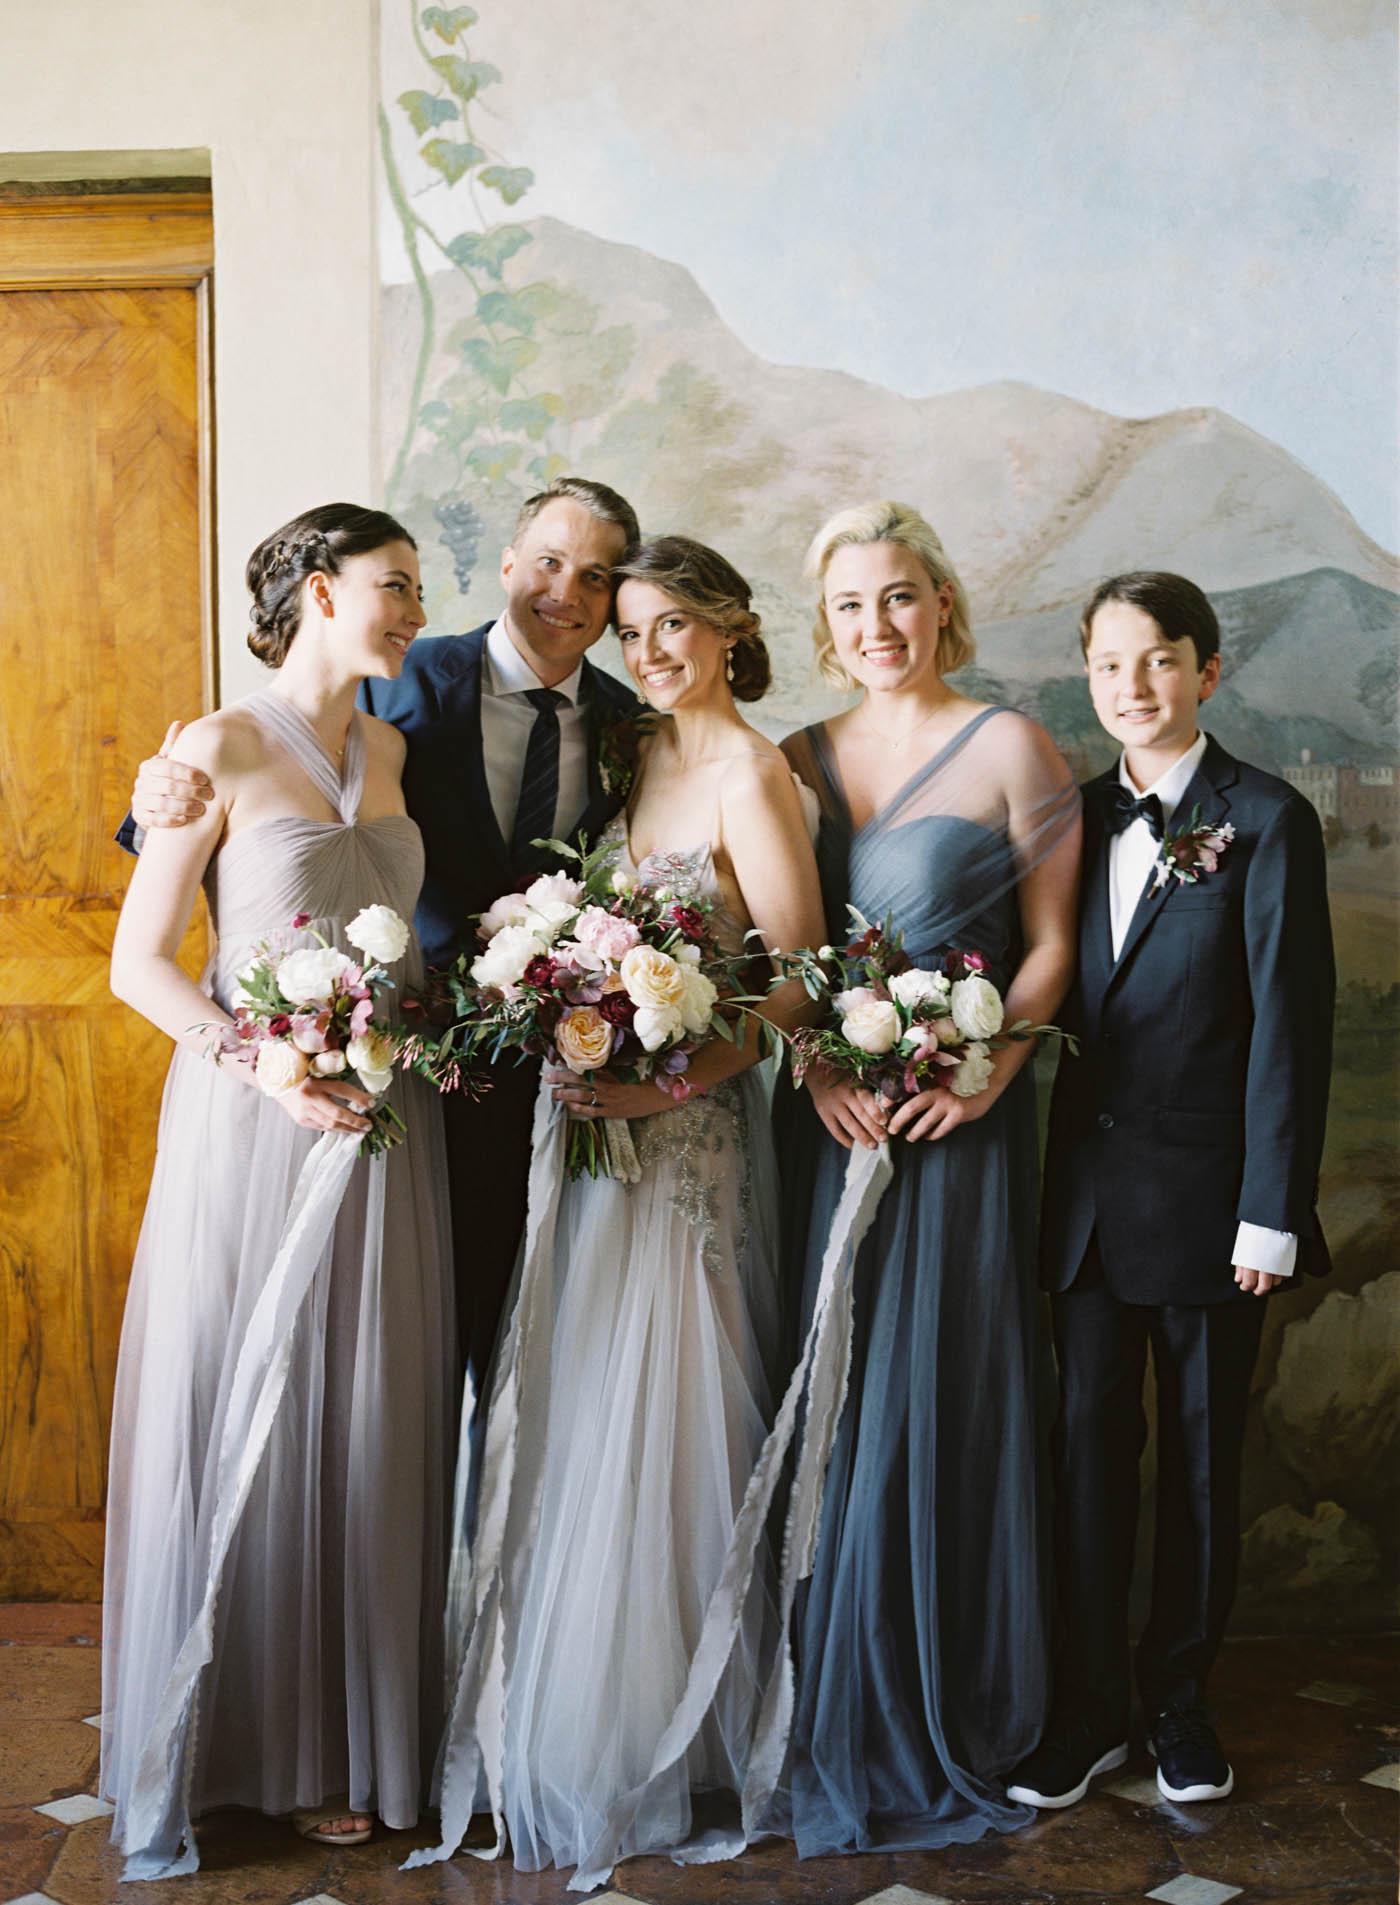 Villa_Cetinale_Wedding-30-Jen_Huang-ElanJacob-211-Jen_Huang-007309-R1-014.jpg